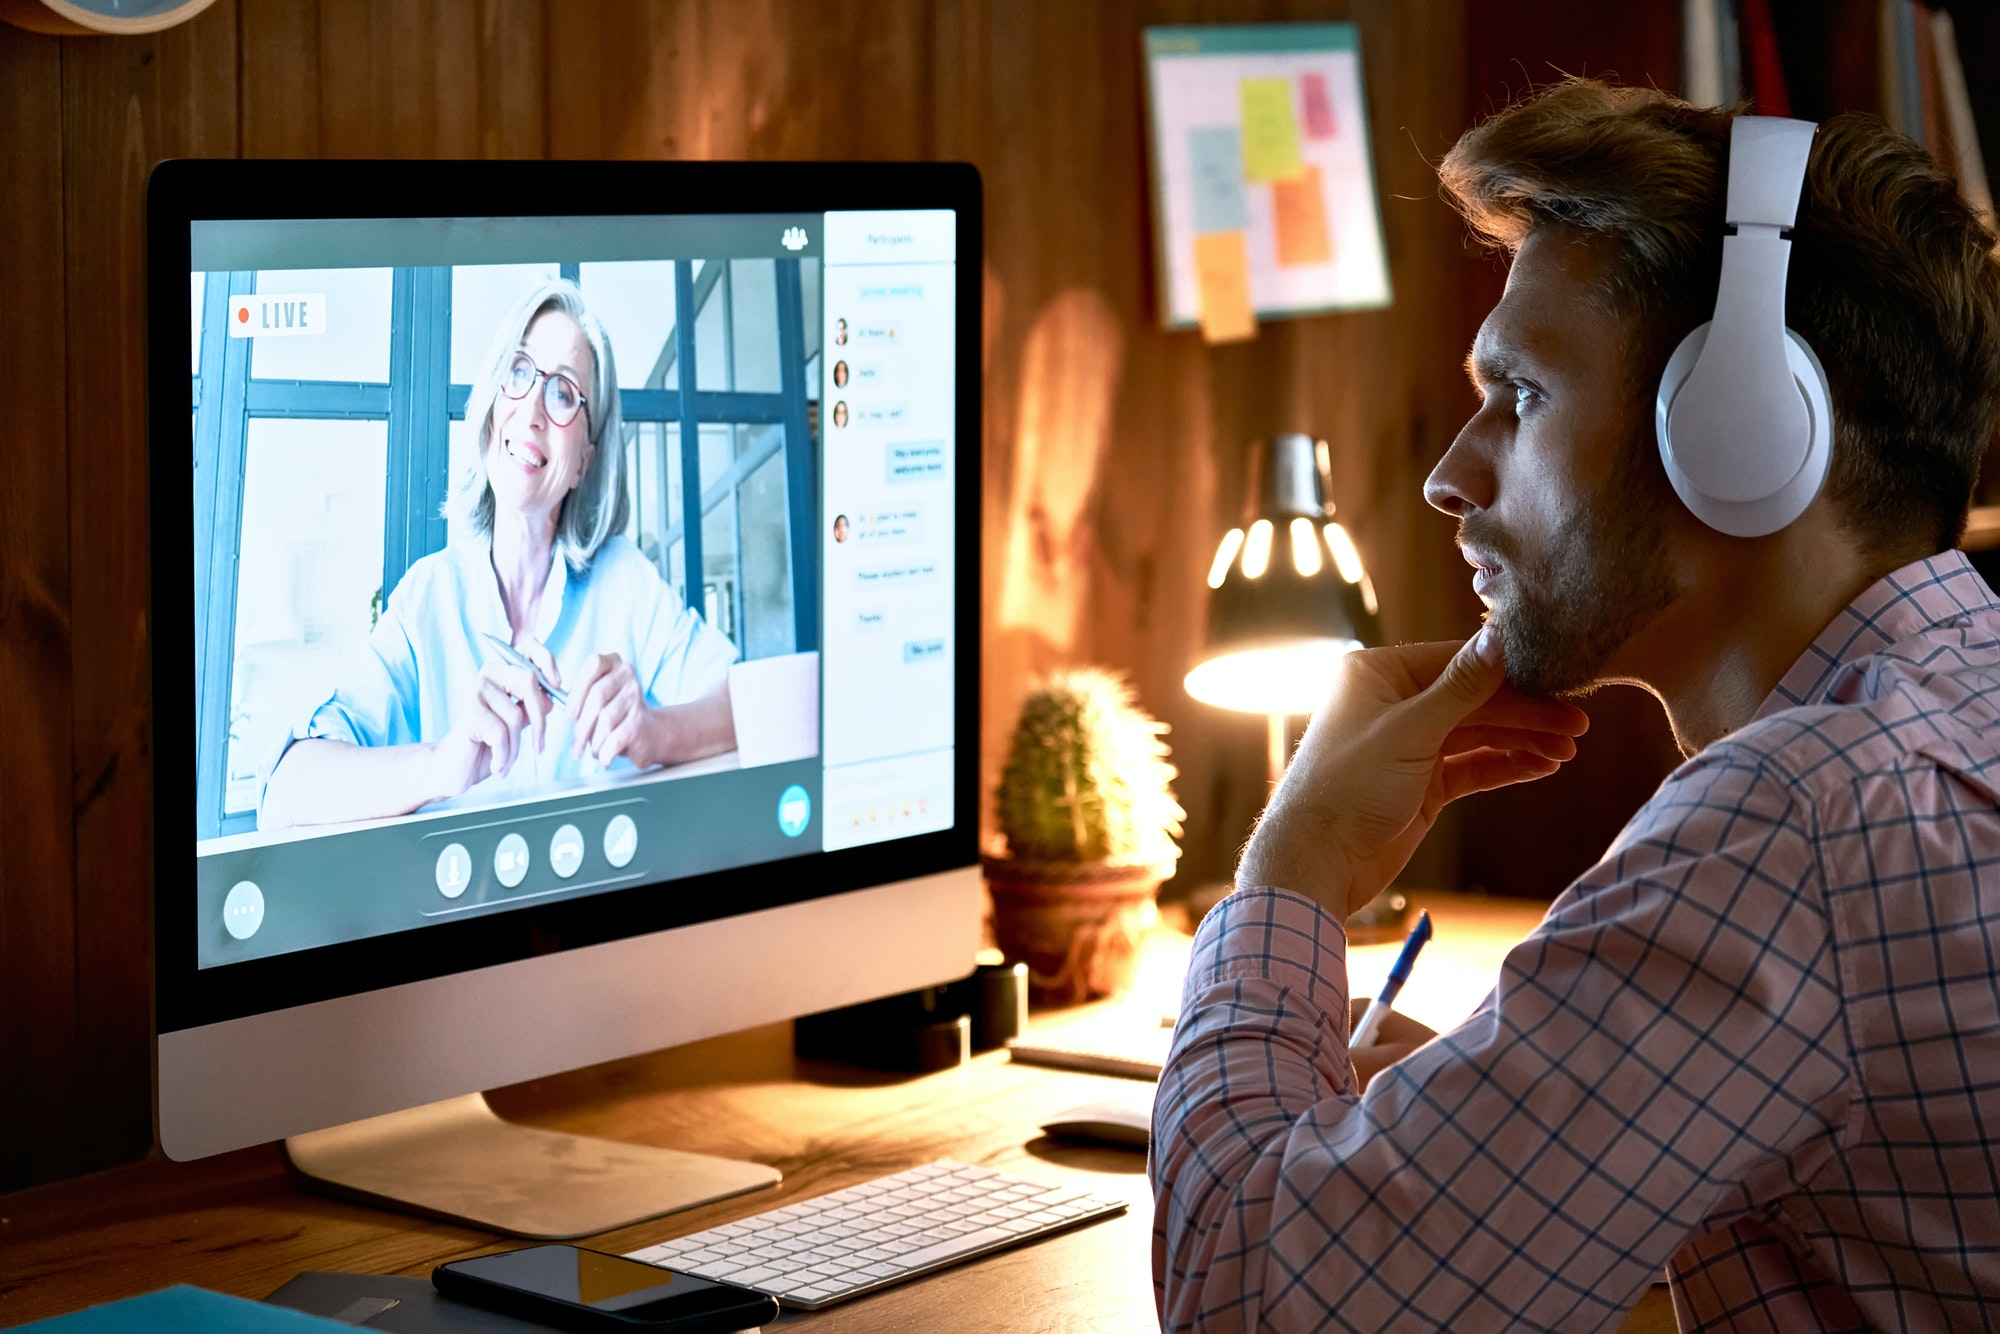 Serious male student wearing headphones taking online course, watching webinar.